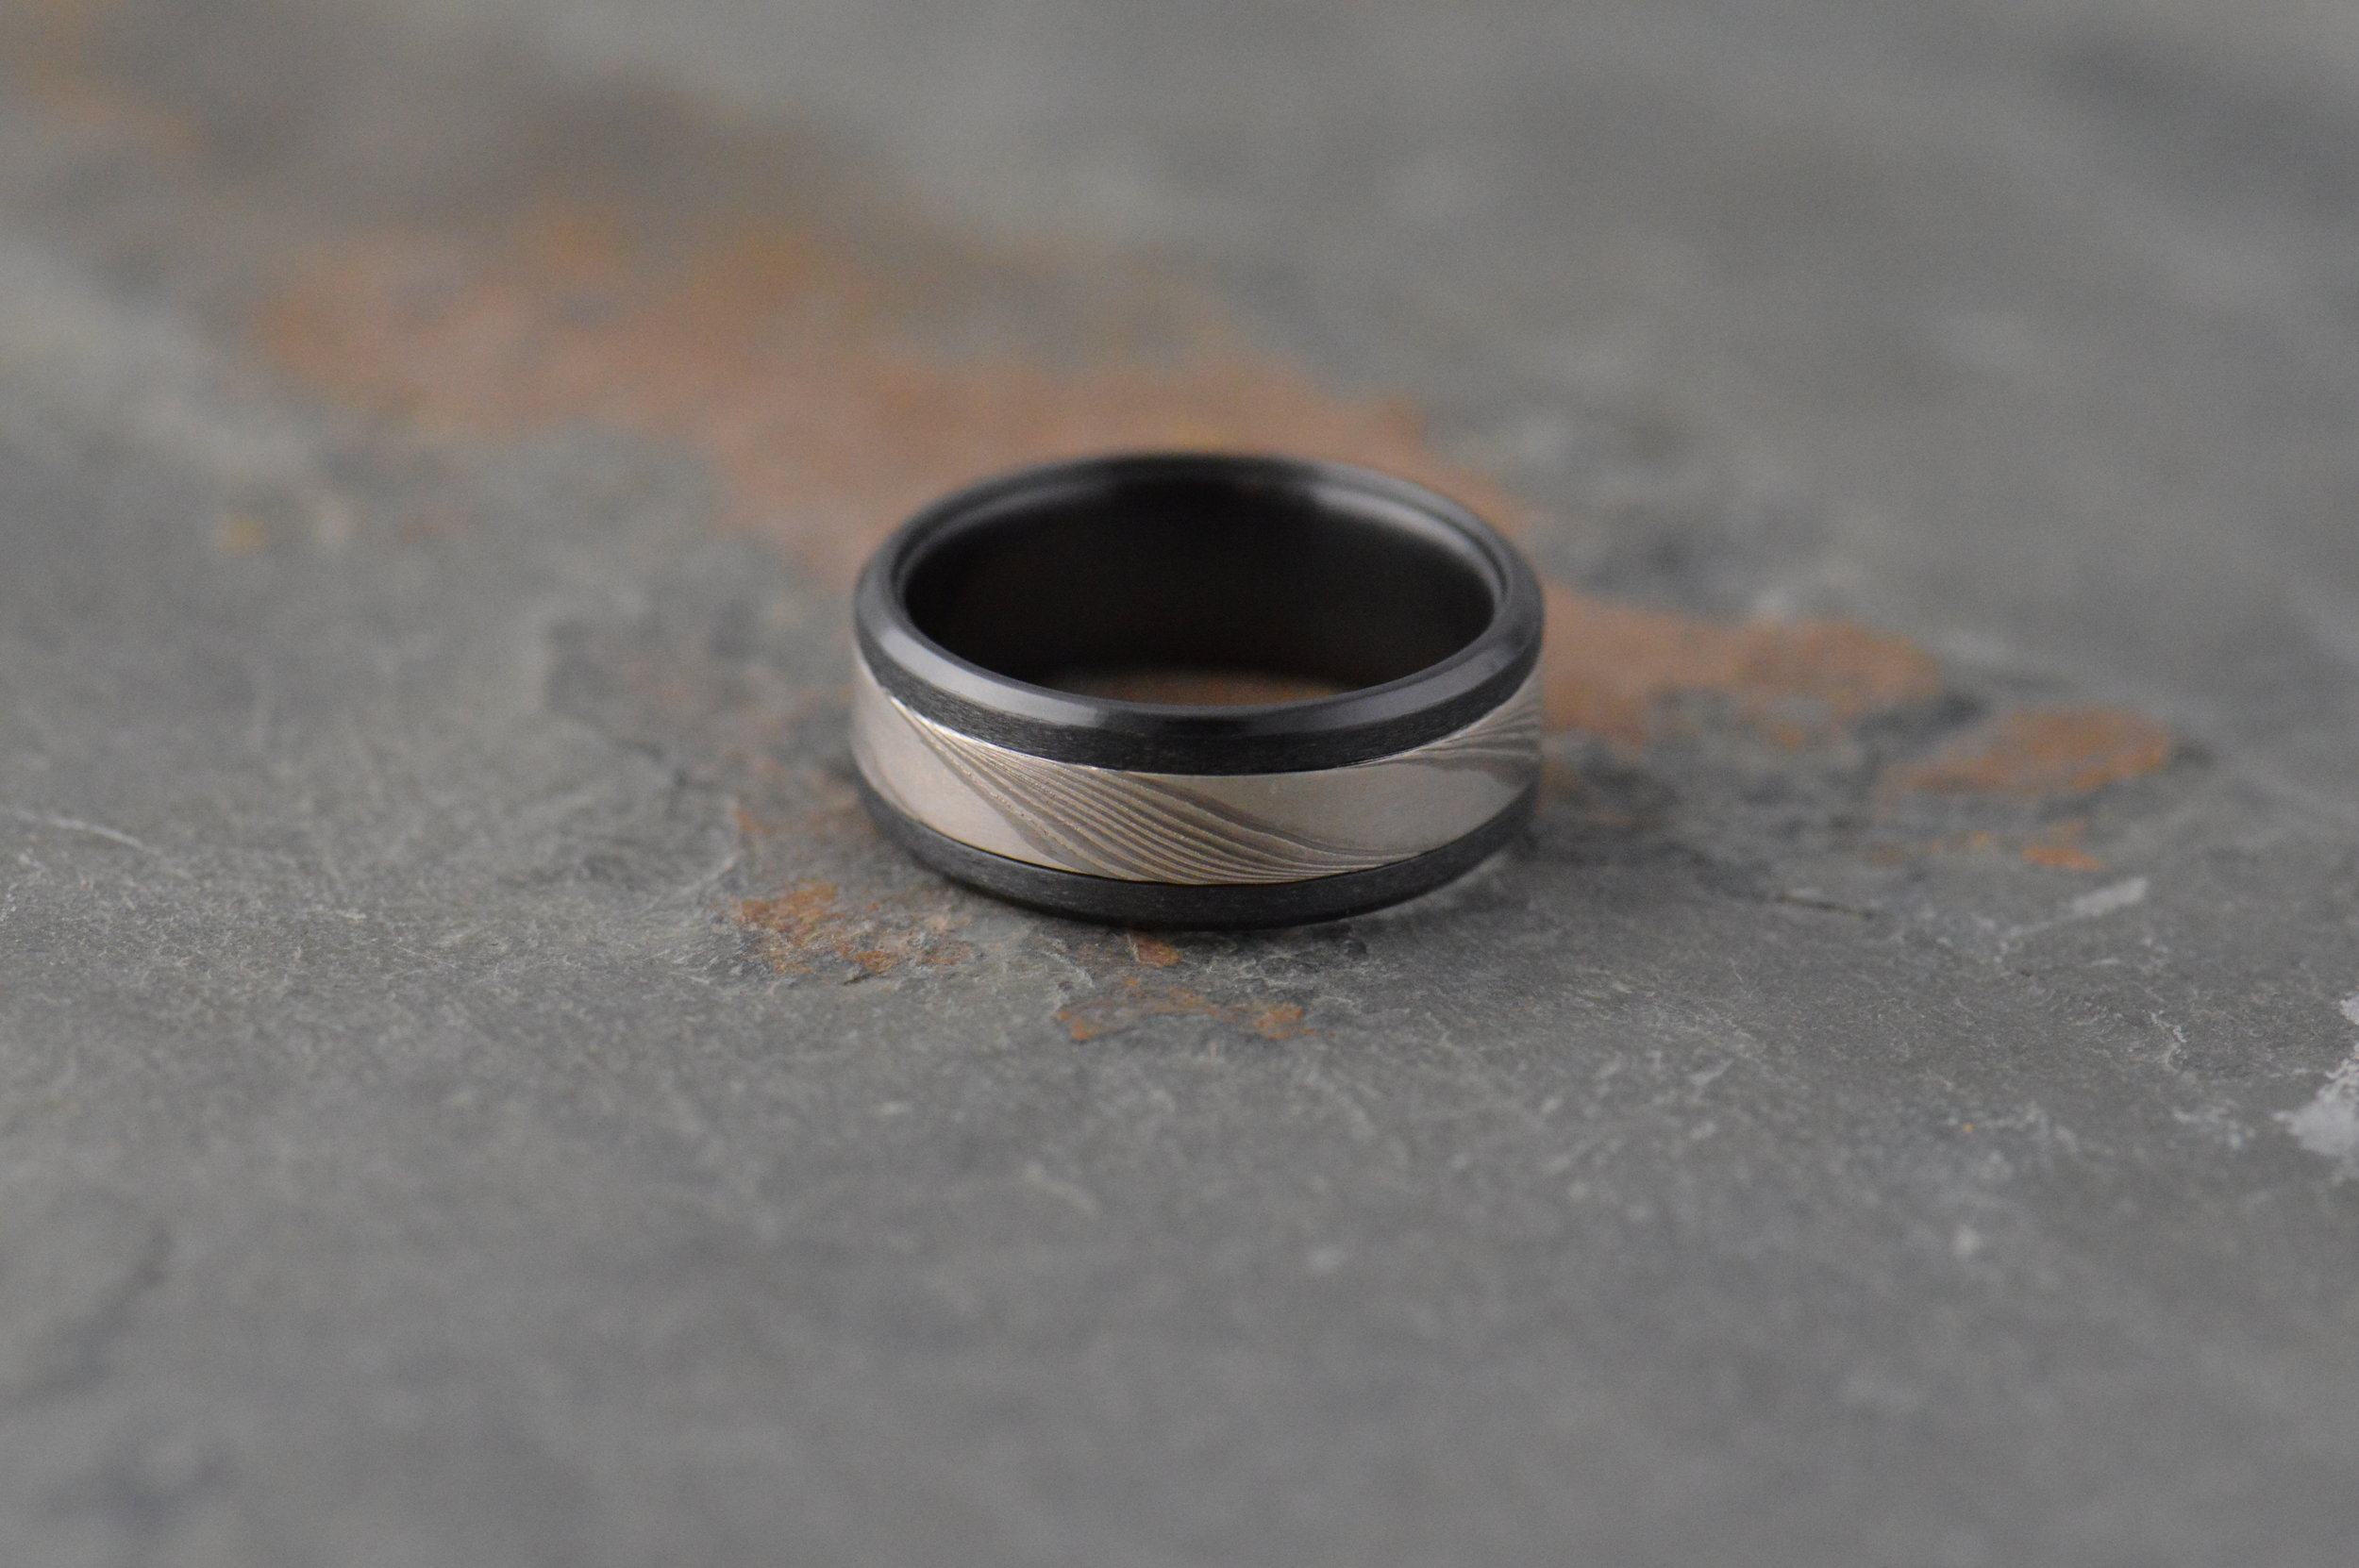 darvier-twist-mokume-zirconium-ring.JPG